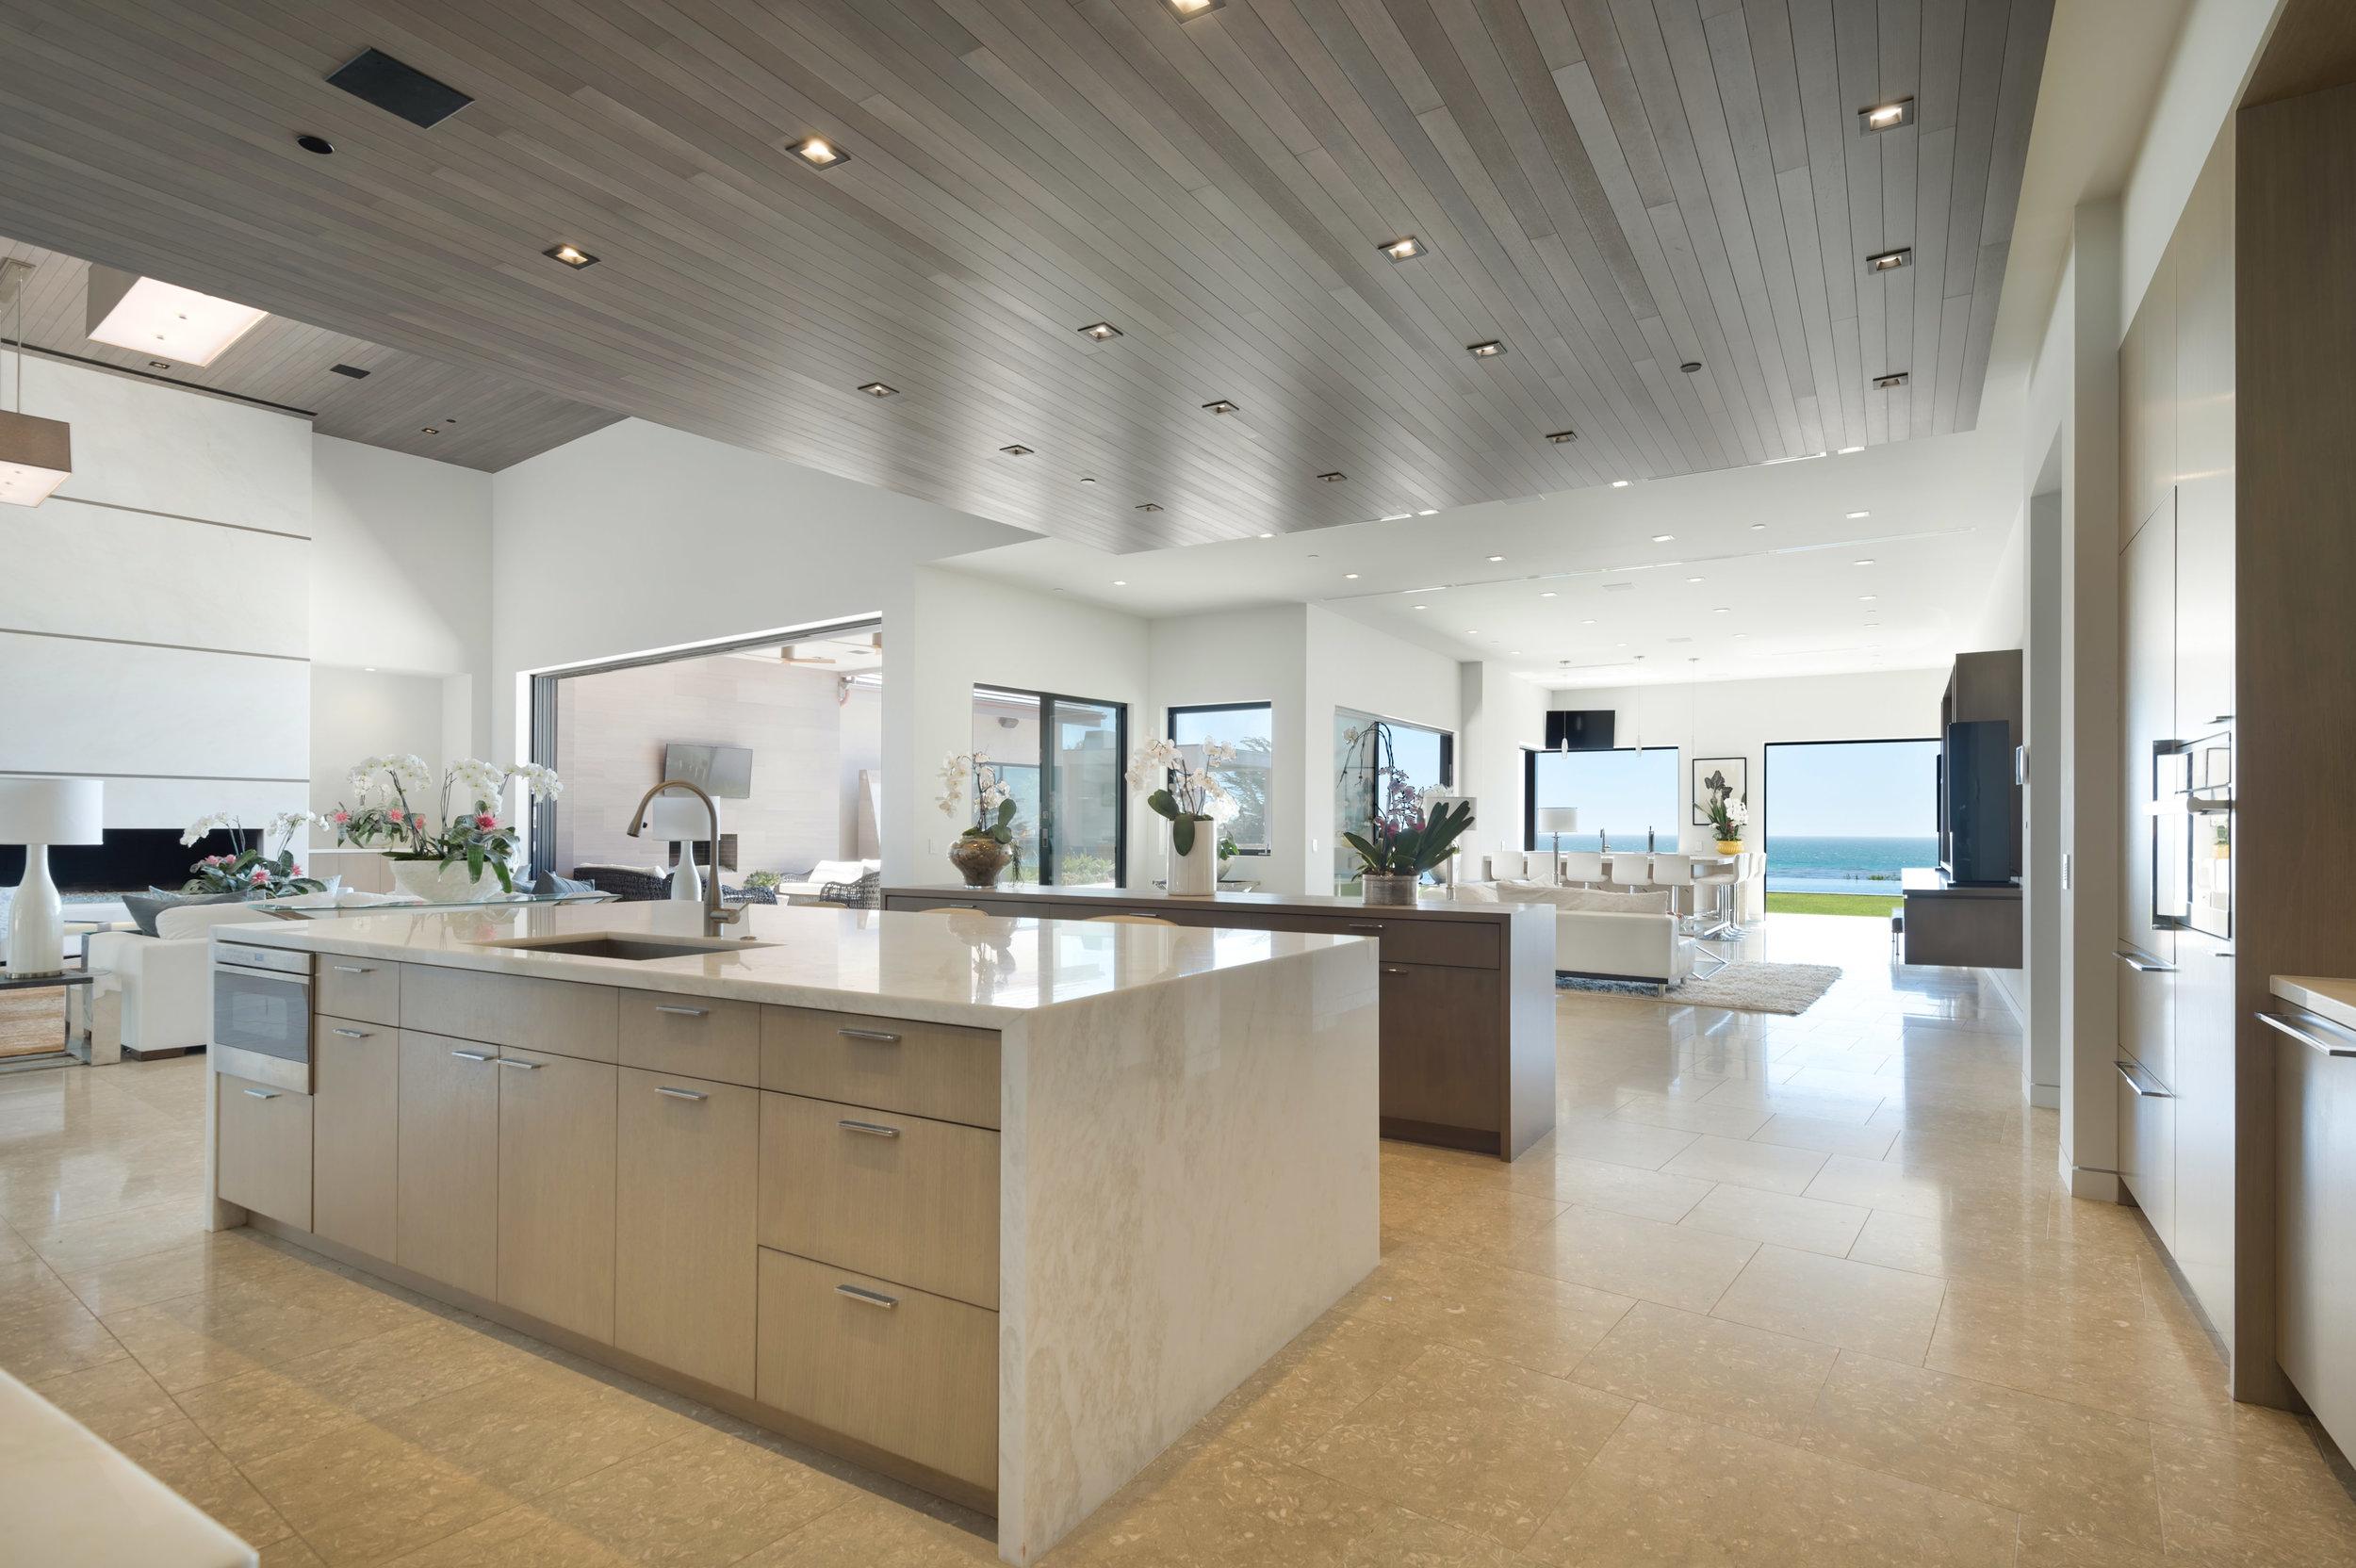 009 kitchen 2 11902 Ellice Street Malibu For Sale The Malibu Life Team Luxury Real Estate.jpg